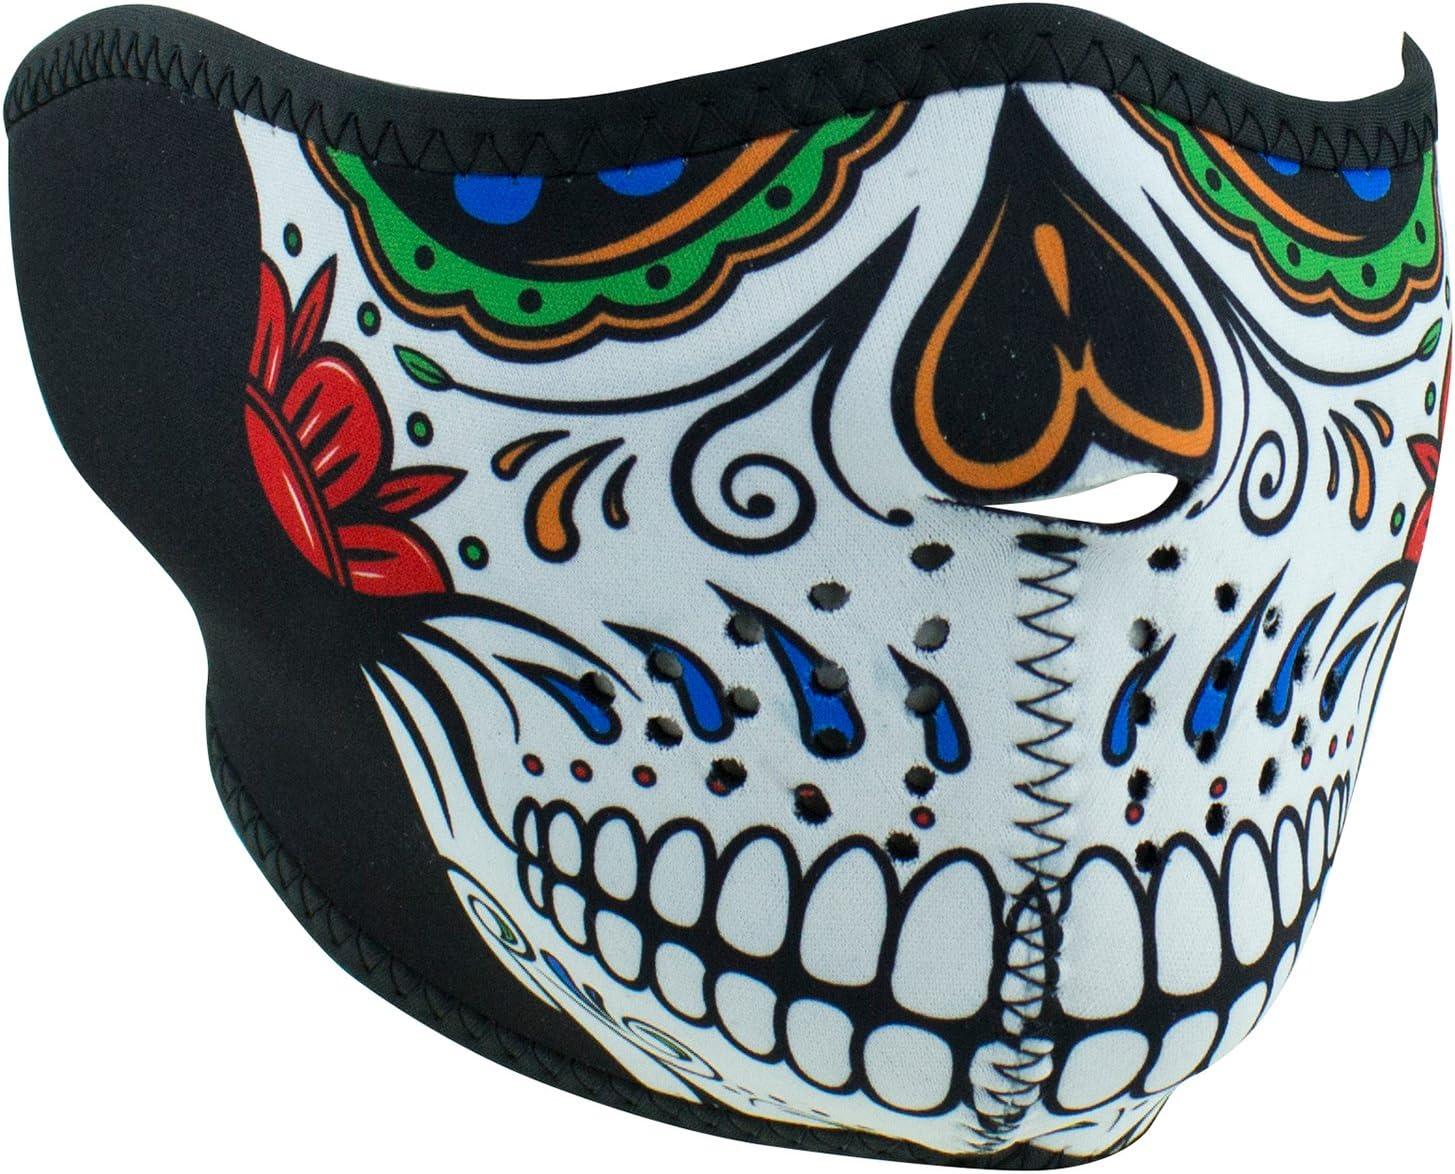 Zan Half-Face Neoprene Mask Muerte Skull WNFM413H